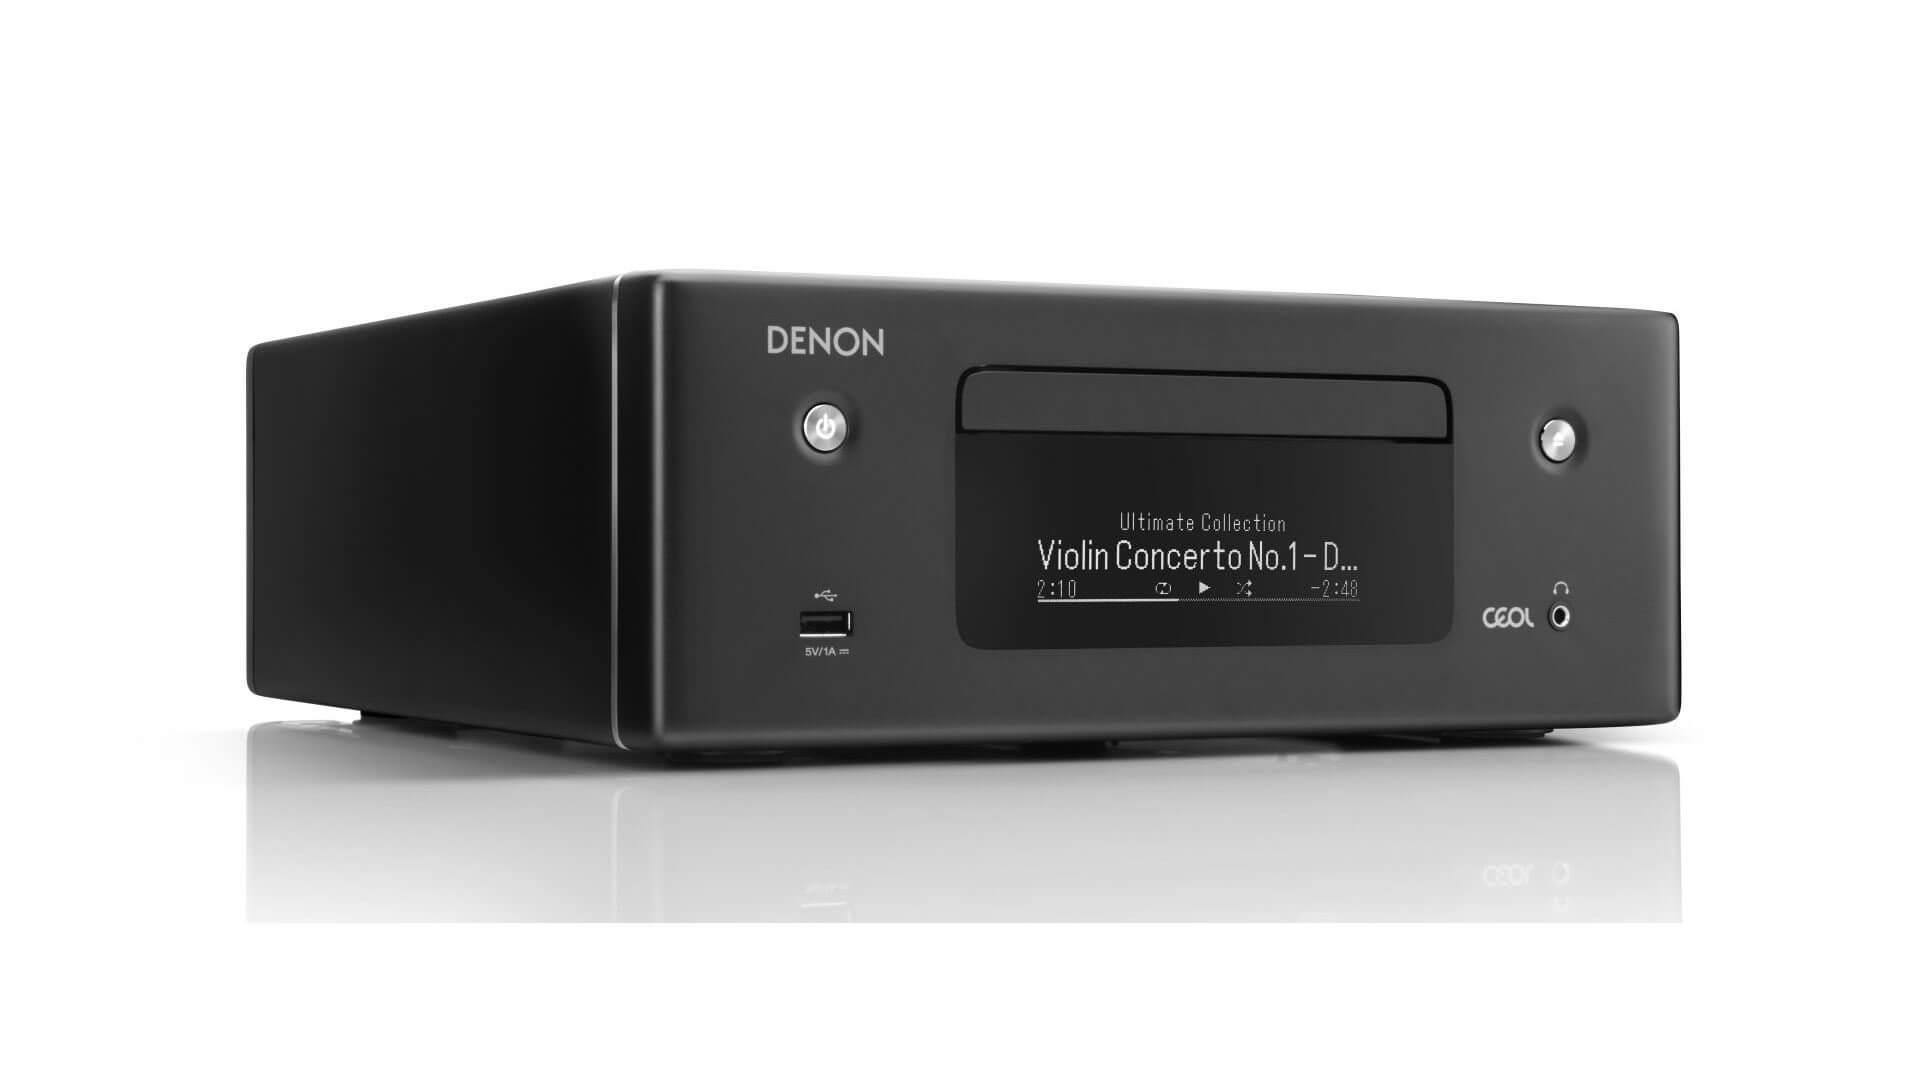 Afholte TEST: Denon CEOL N10 - Bonsai-stereo | Lyd & Billede RN-36